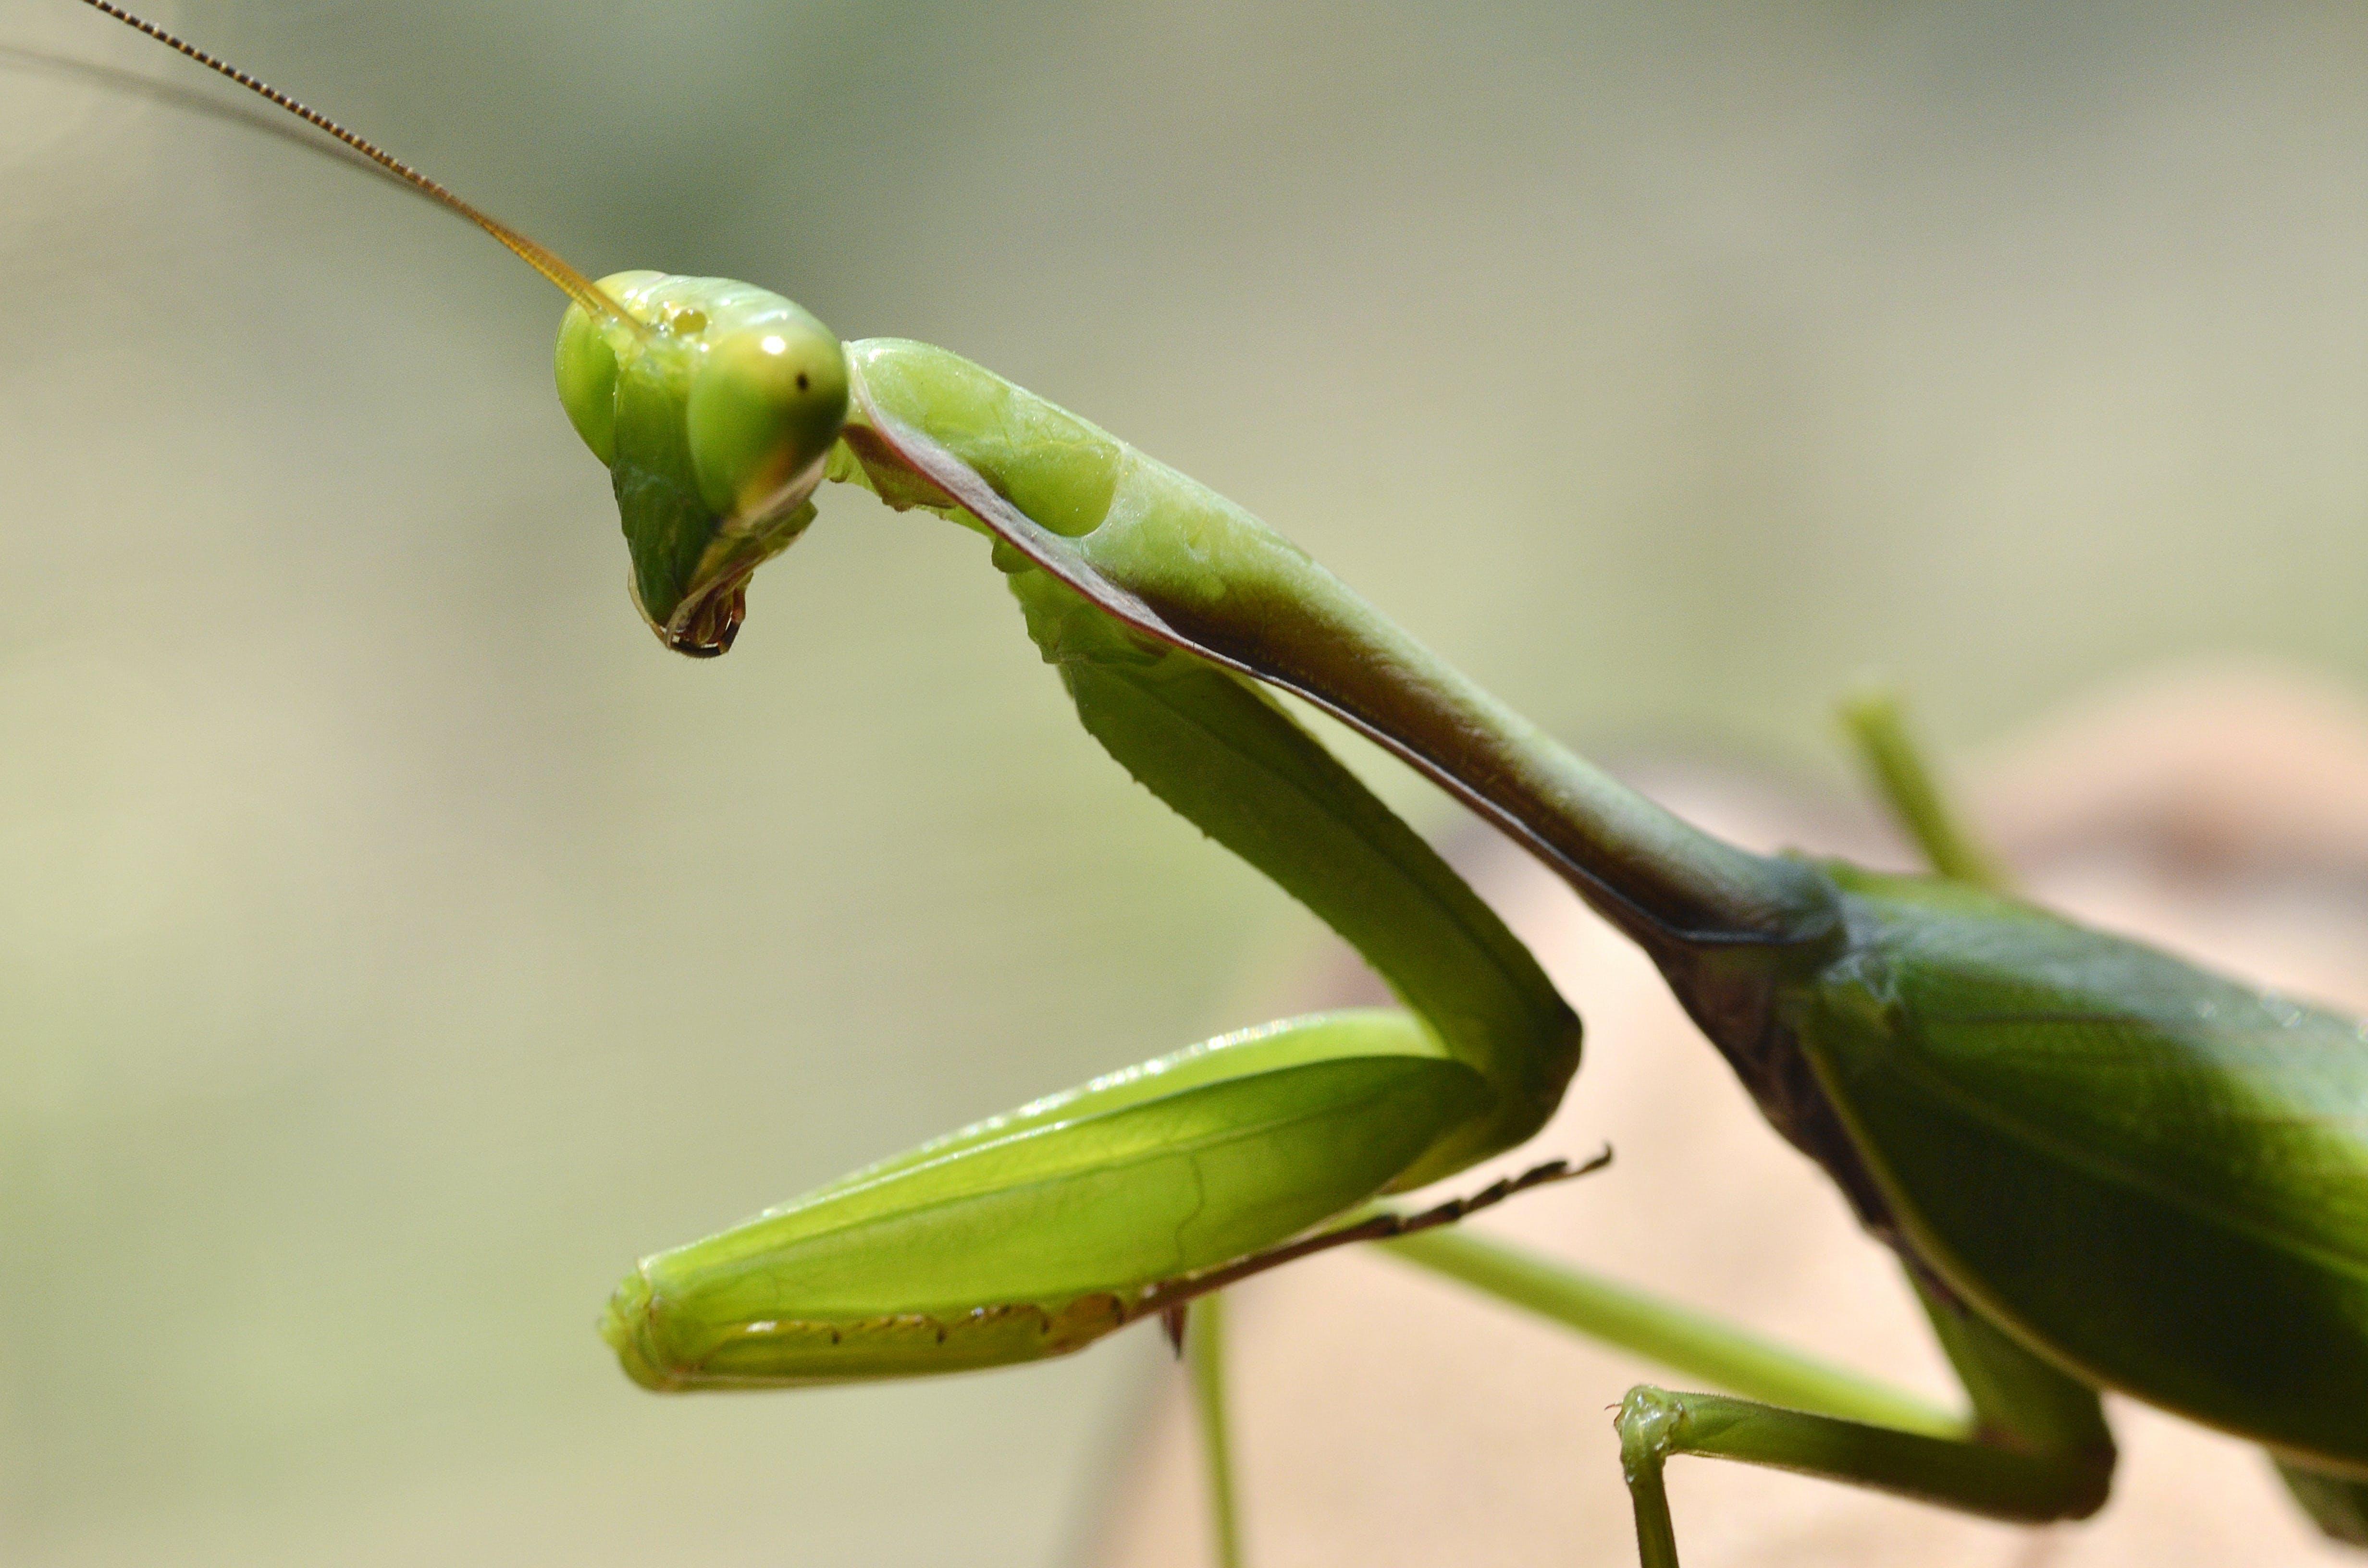 Green Praying Mantis in Close-up Photography